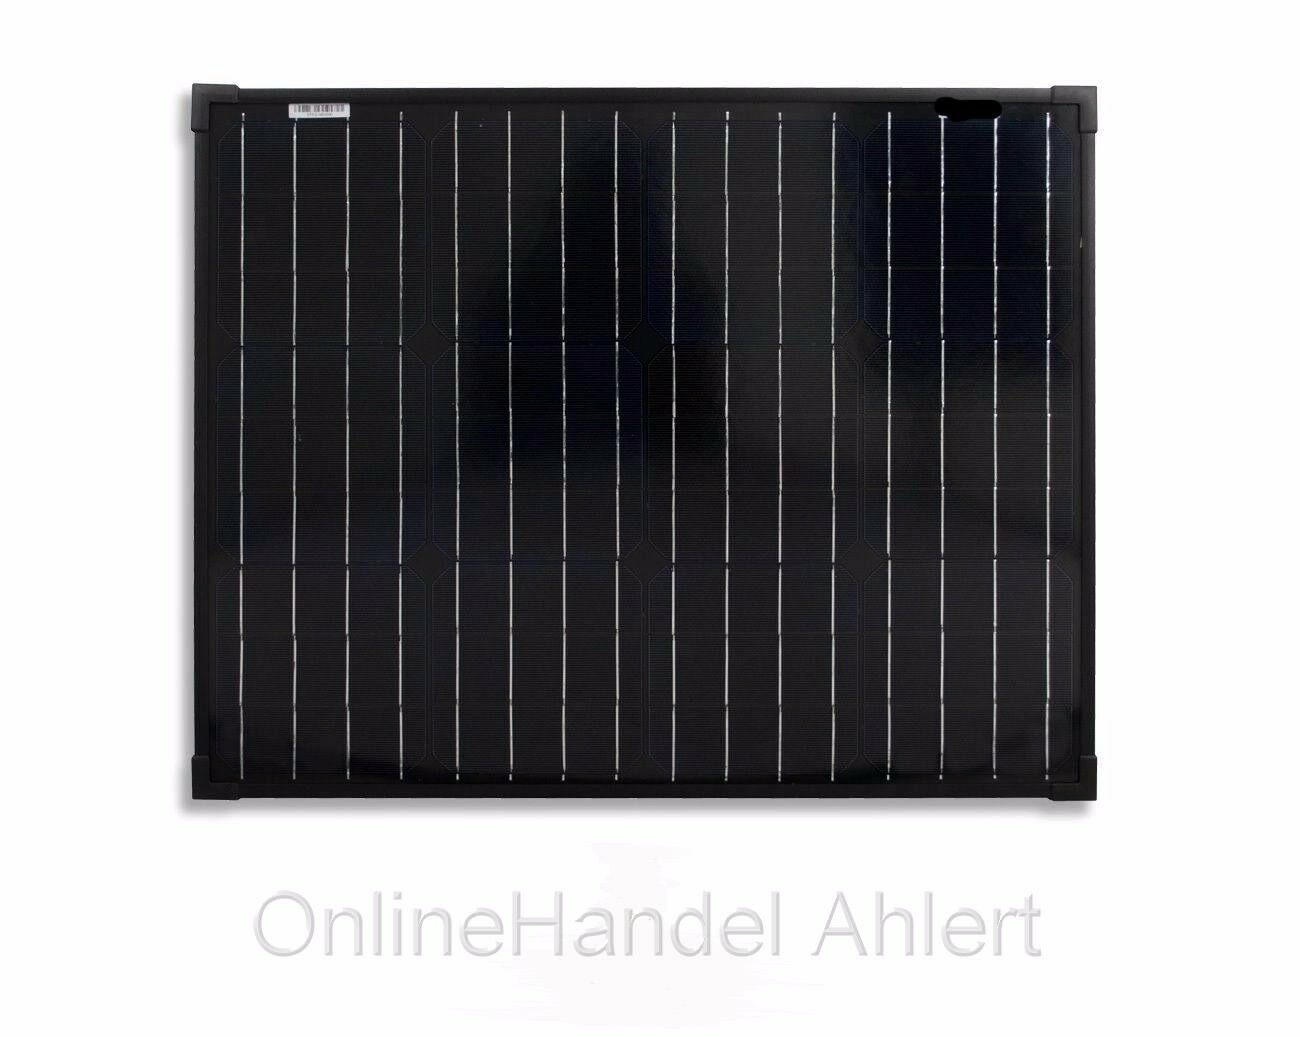 50w solarpumpe teichpumpe gartenteichpumpe solar teich. Black Bedroom Furniture Sets. Home Design Ideas